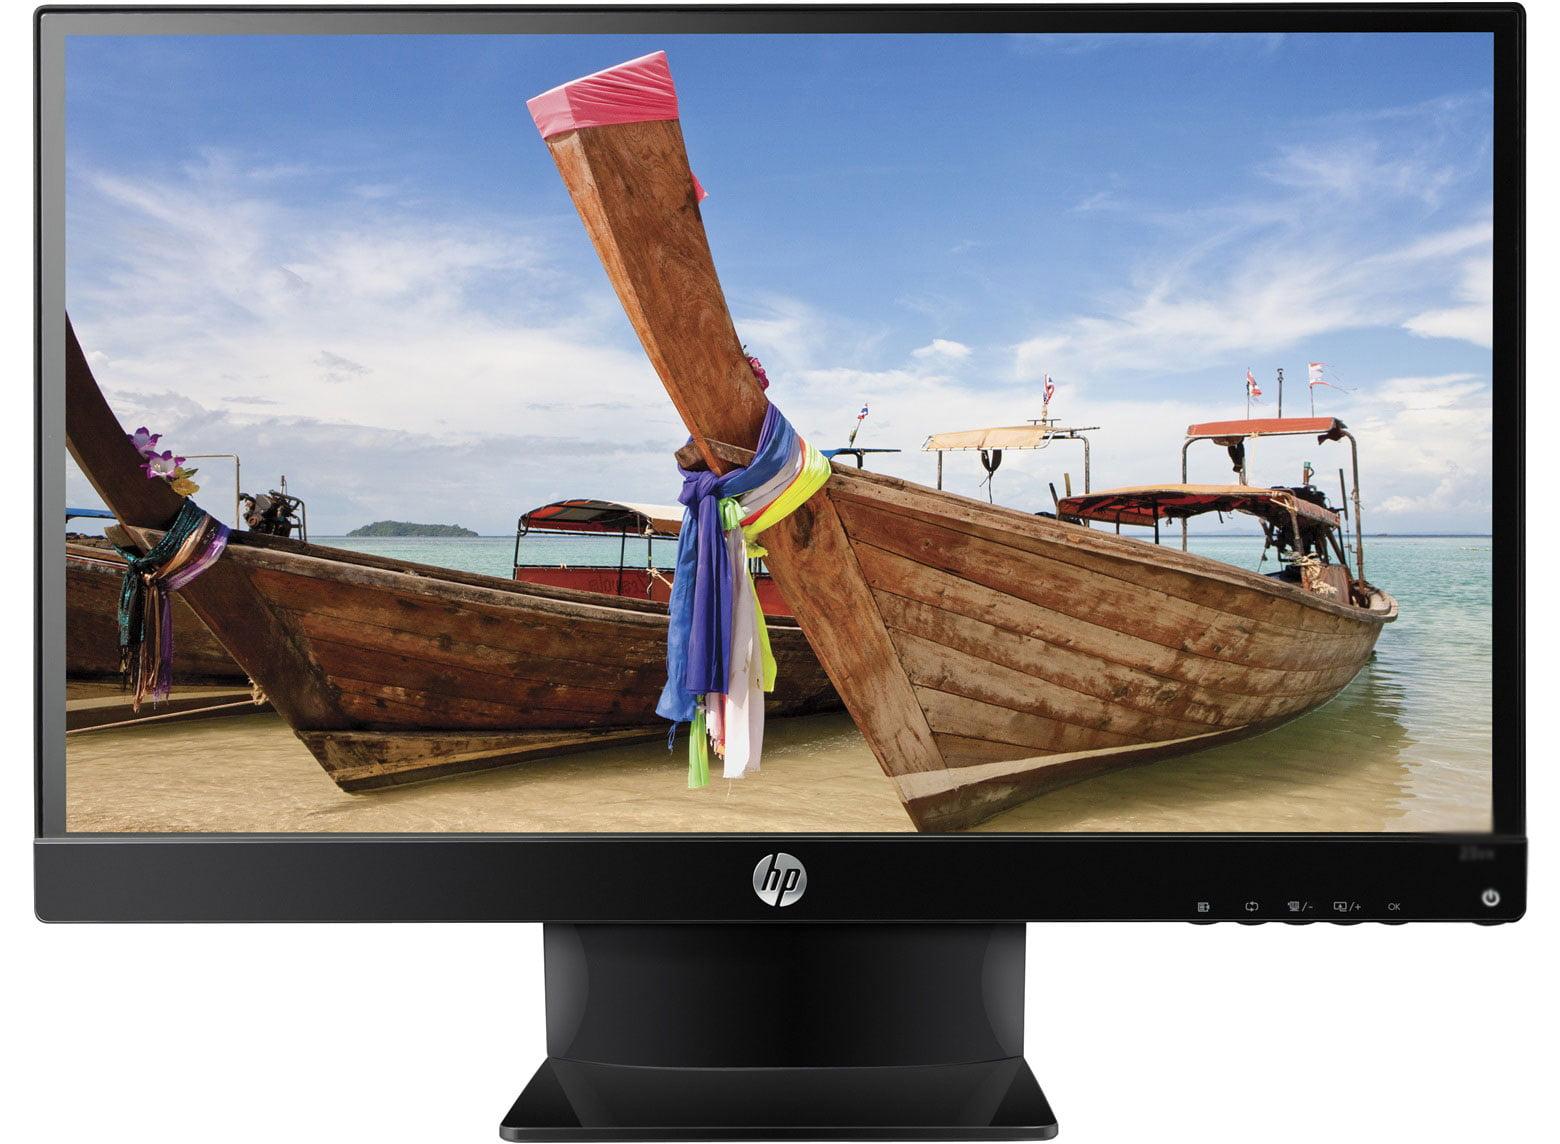 Refurbished - HP Pavilion 25vx 25 IPS LED Backlit Monitor 1920x1080 Full HD VGA DVI HDMI 7ms